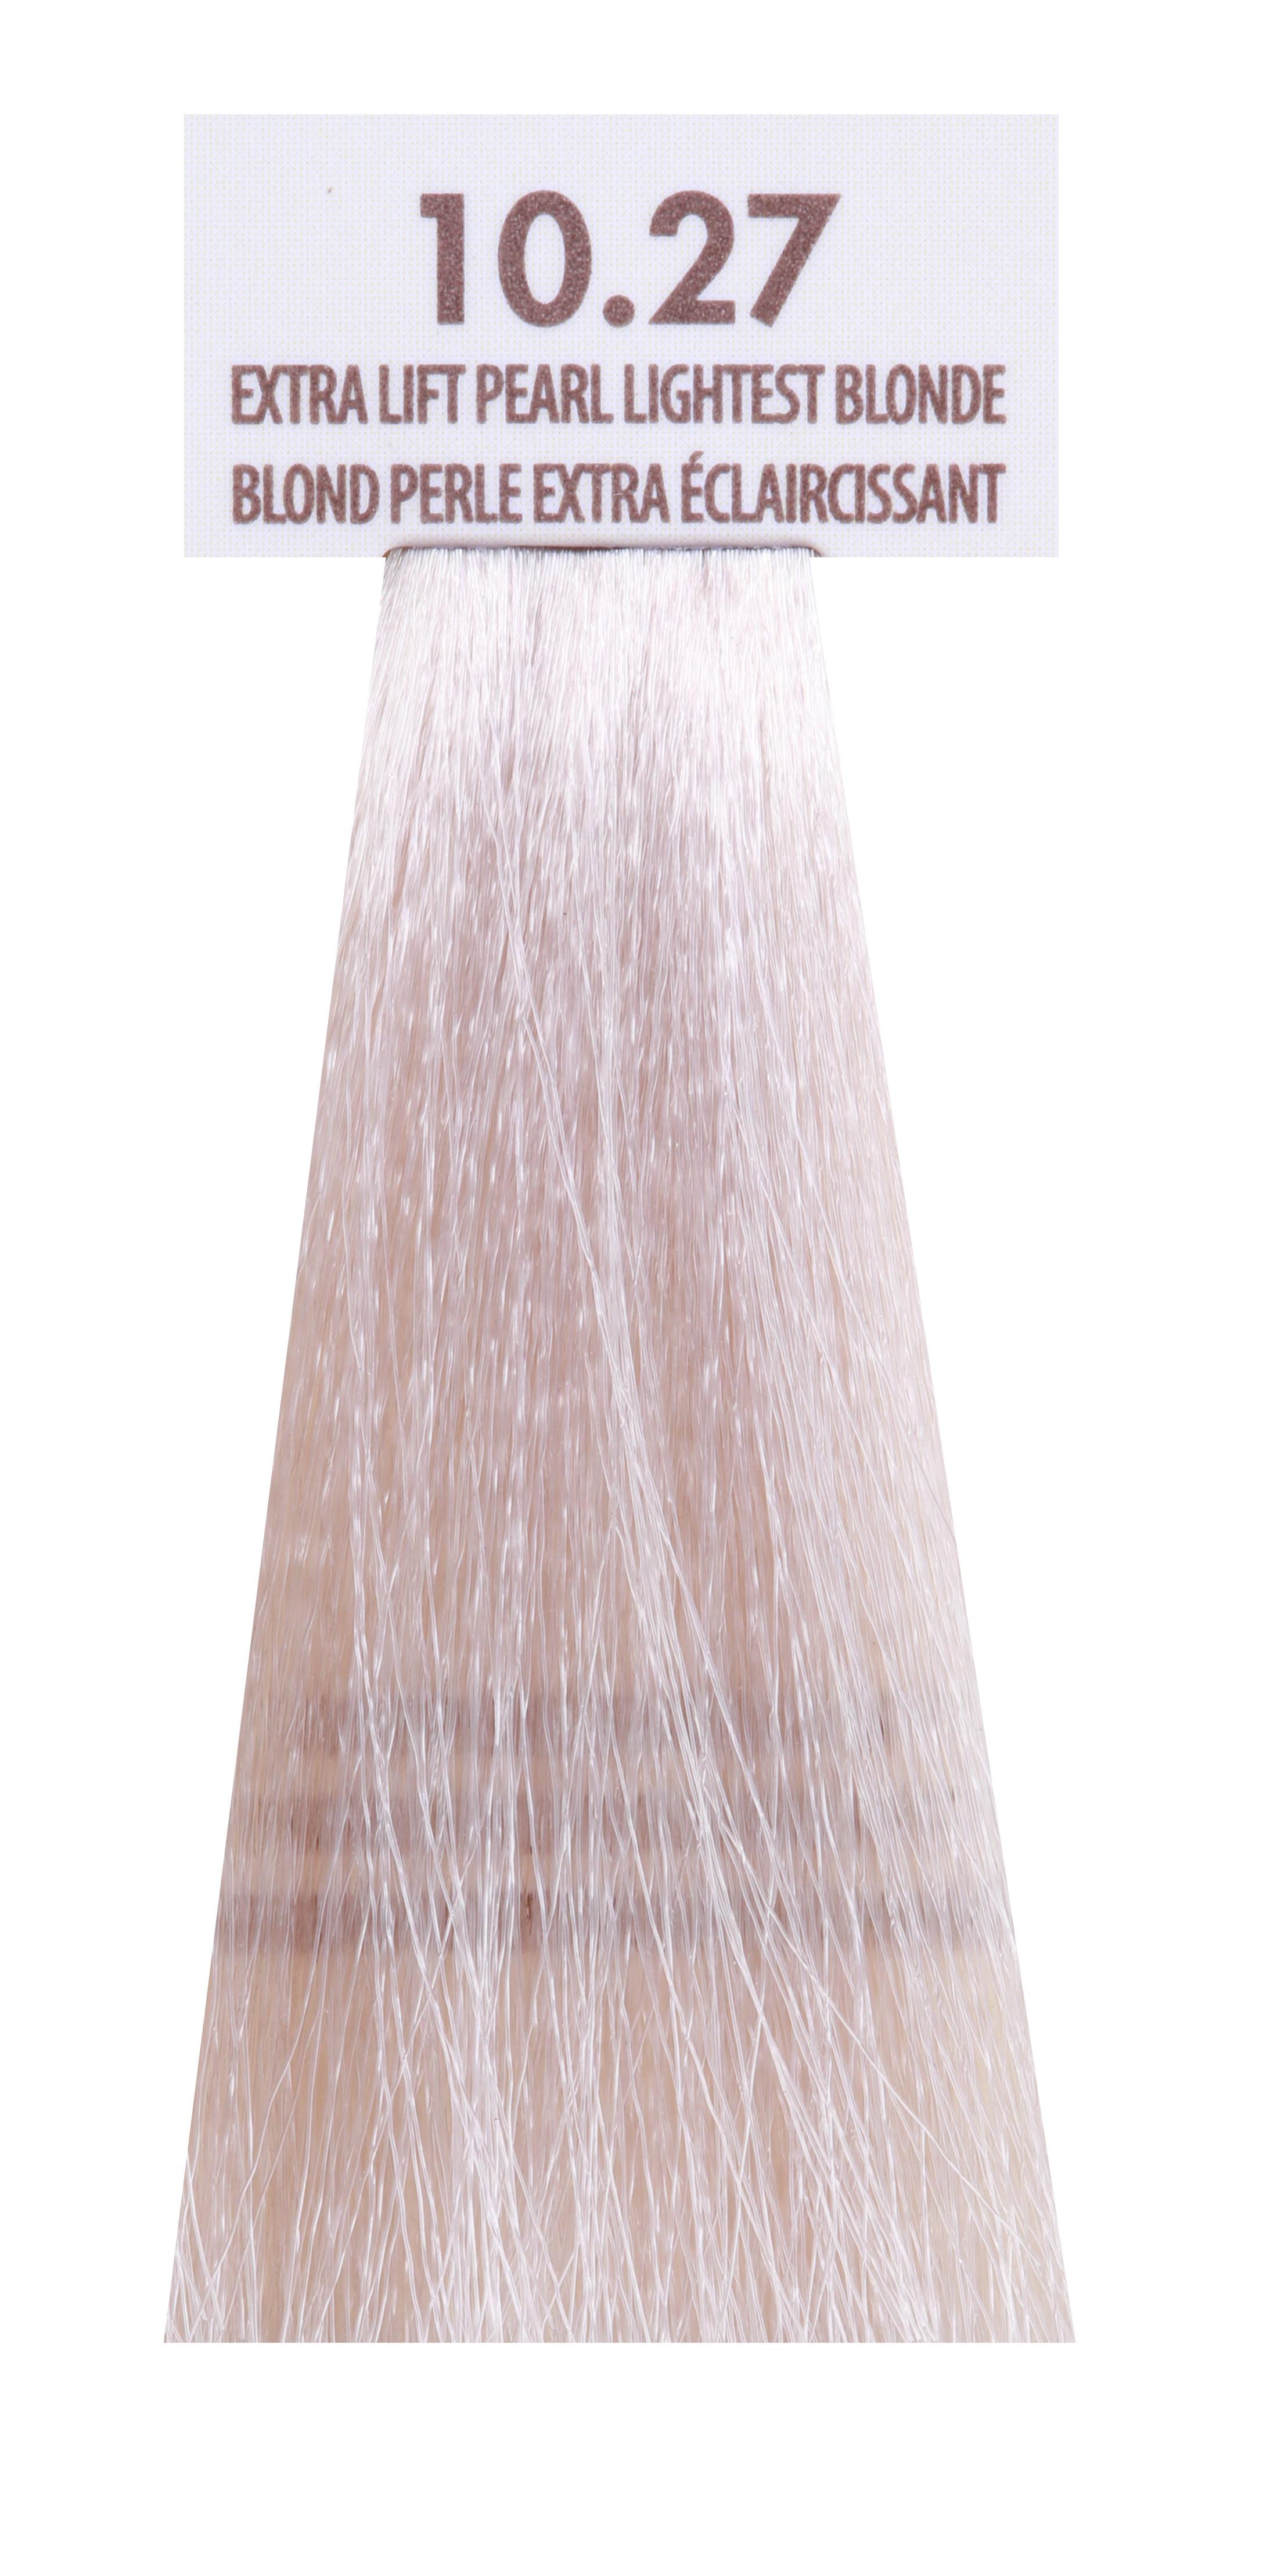 MACADAMIA NATURAL OIL 10.27 краска для волос, осветляющий жемчужный блондин / MACADAMIA COLORS 100 мл